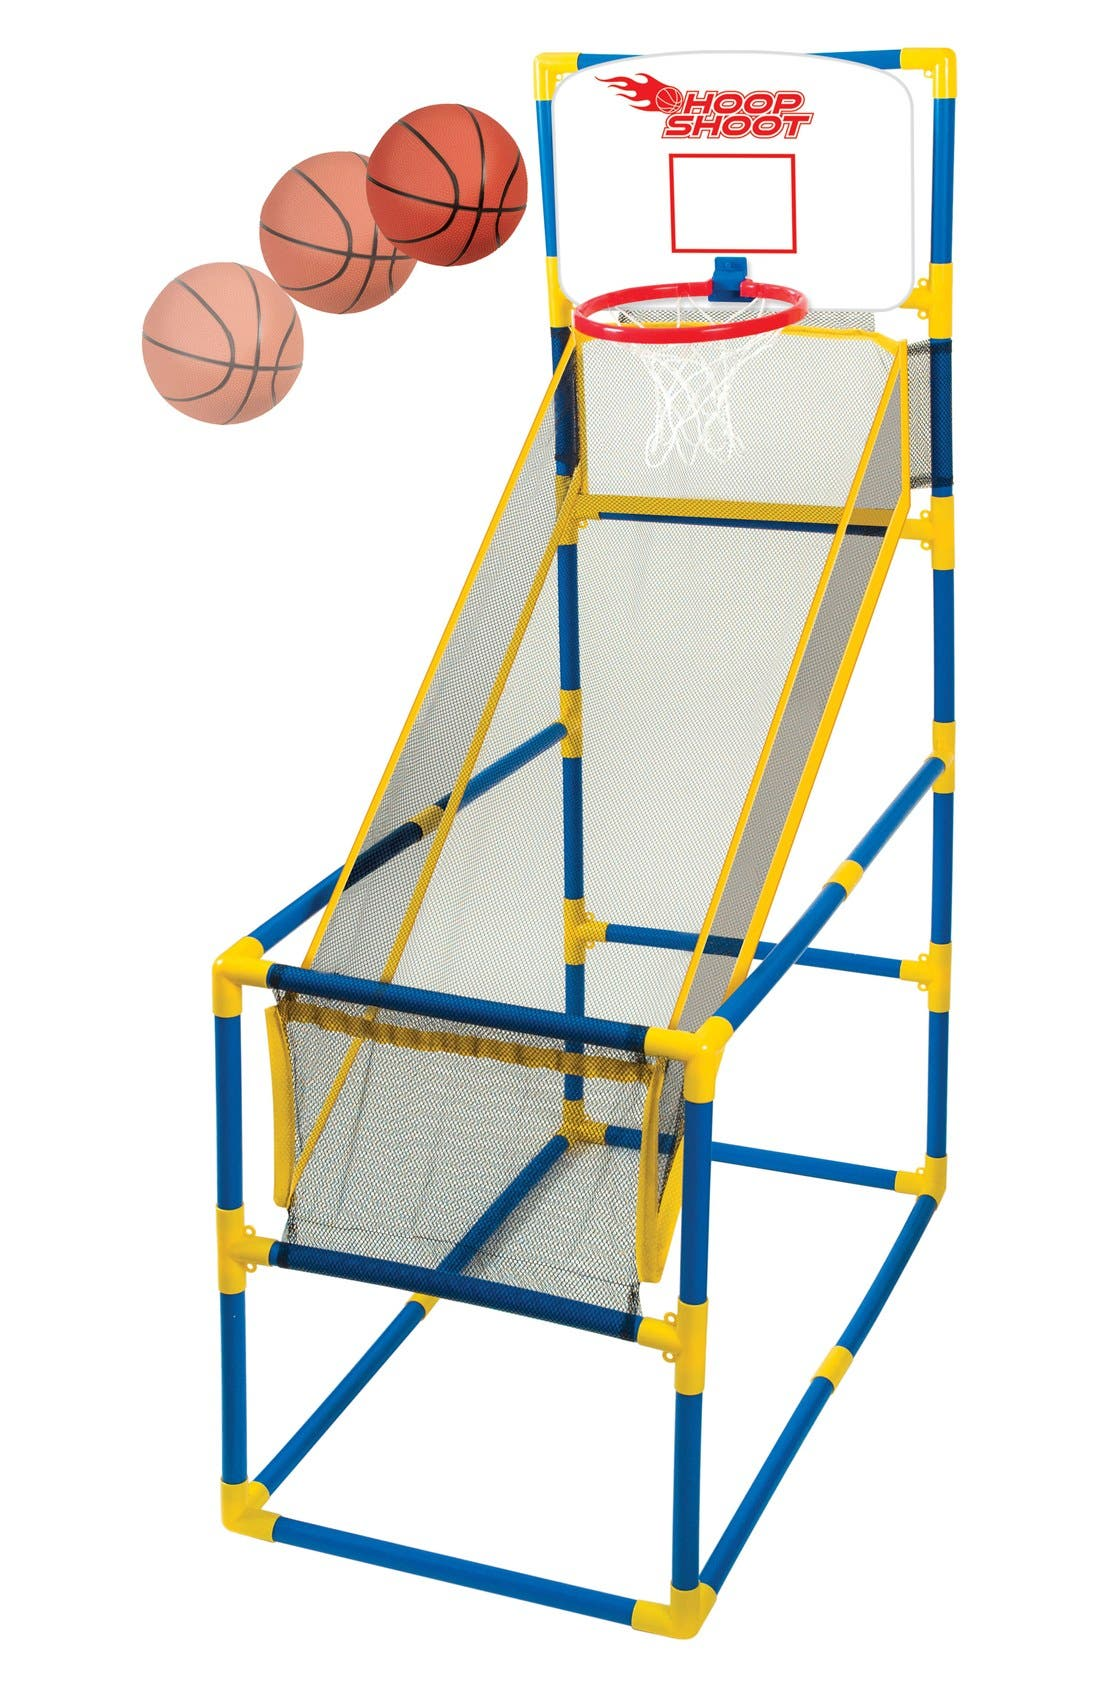 Main Image - Westminster Toys Hoop Shoot Basketball Play Set